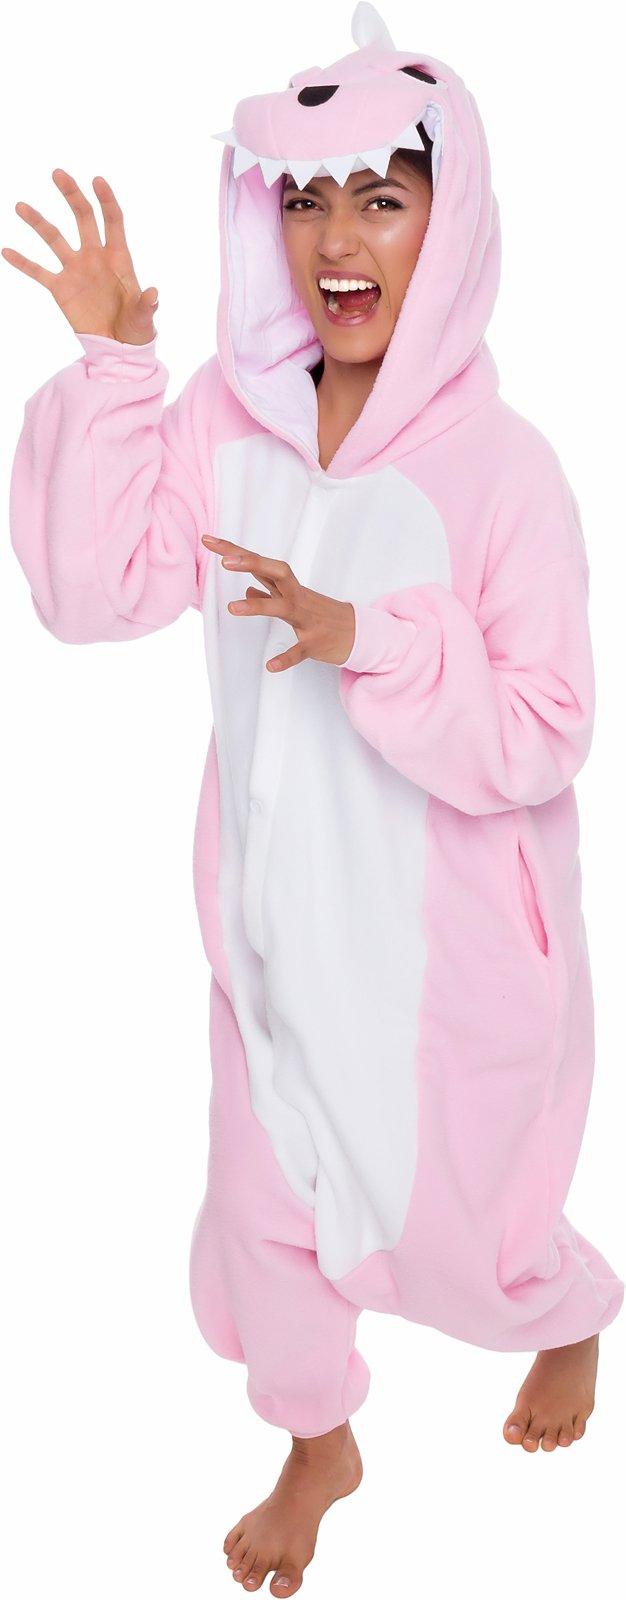 Silver Lilly Unisex Adult Pajamas - One Piece Cosplay Pink Dinosaur Animal Costume (S)